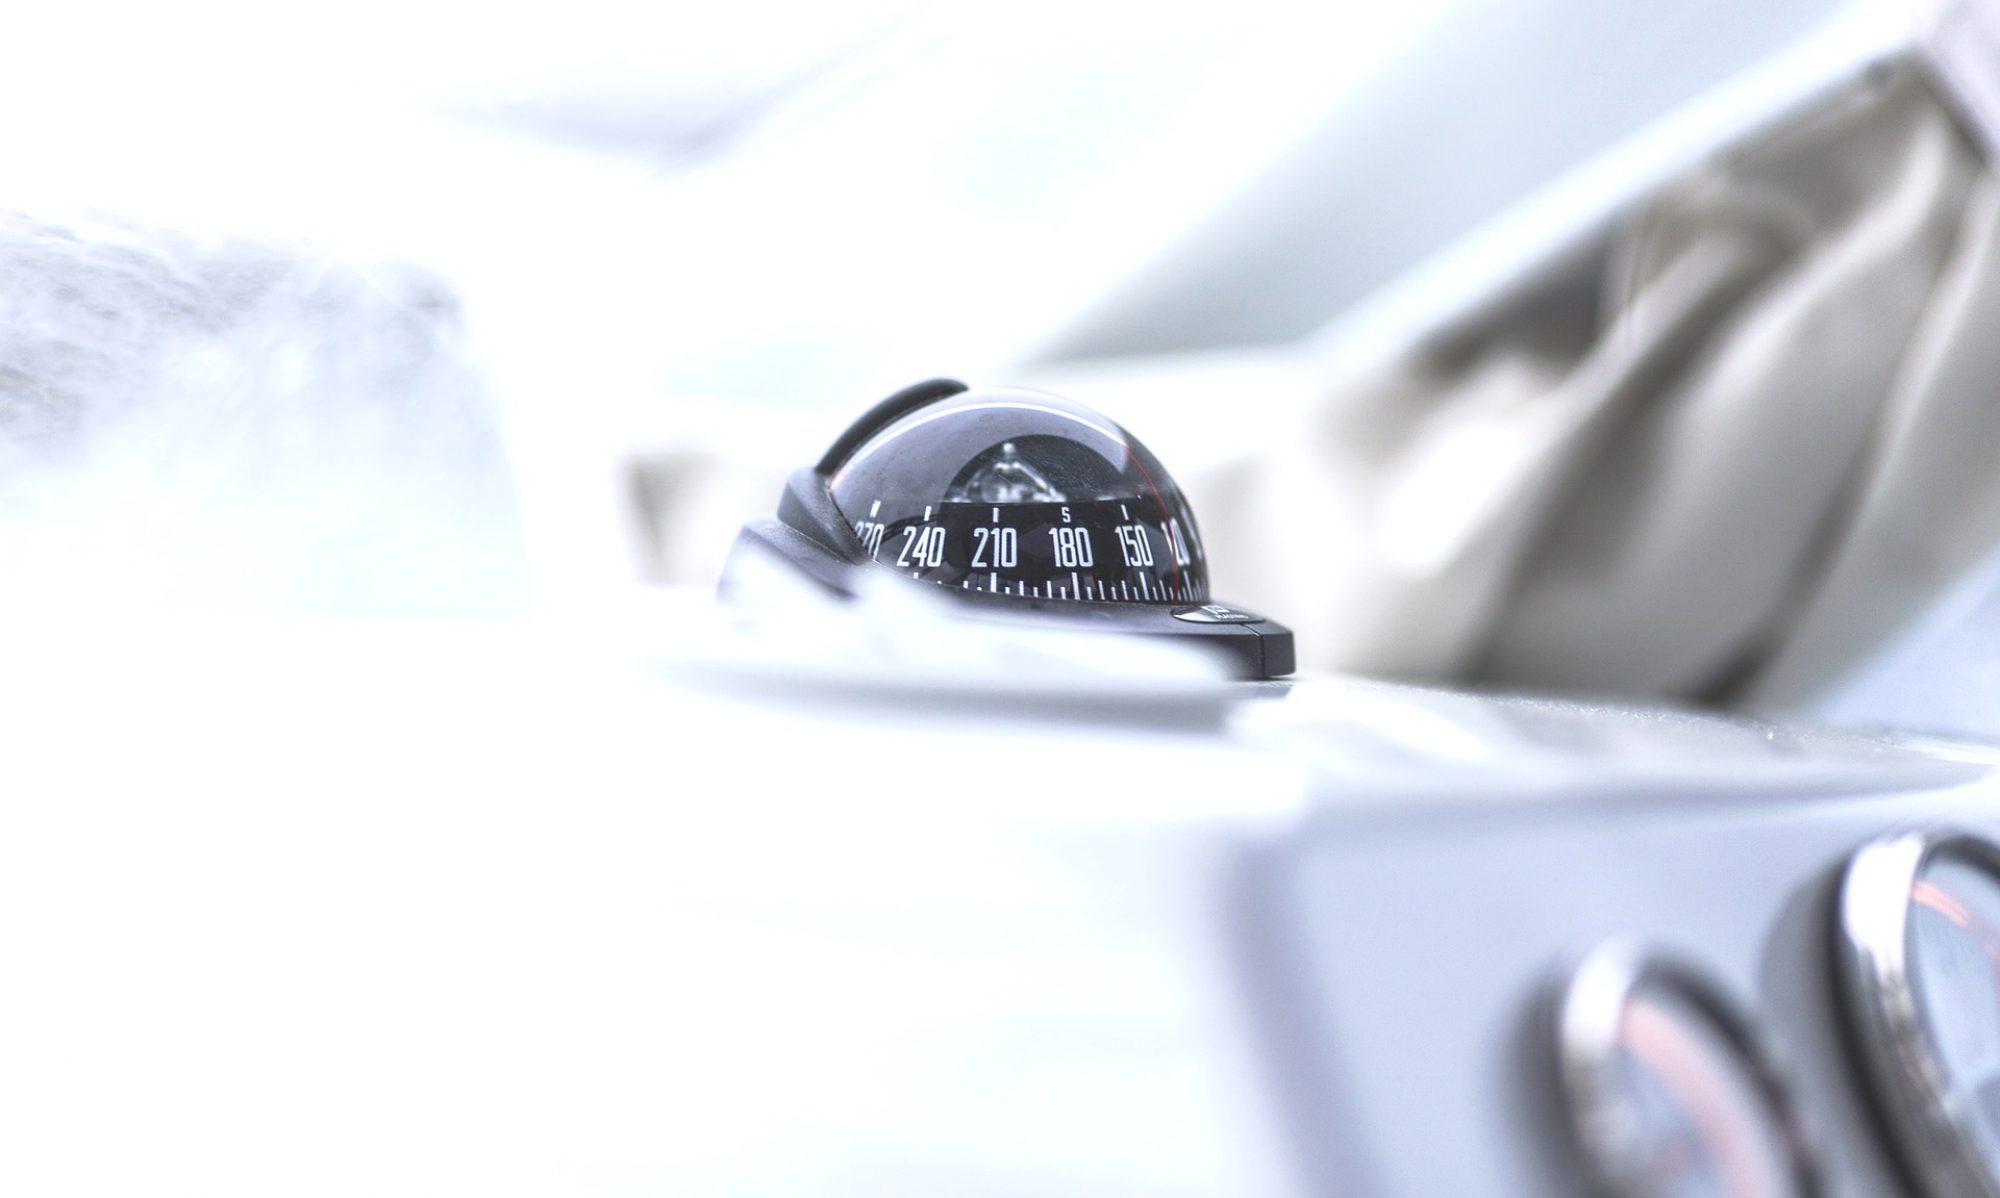 Ohlf Finanzmakler, Versicherungsmakler, Investment